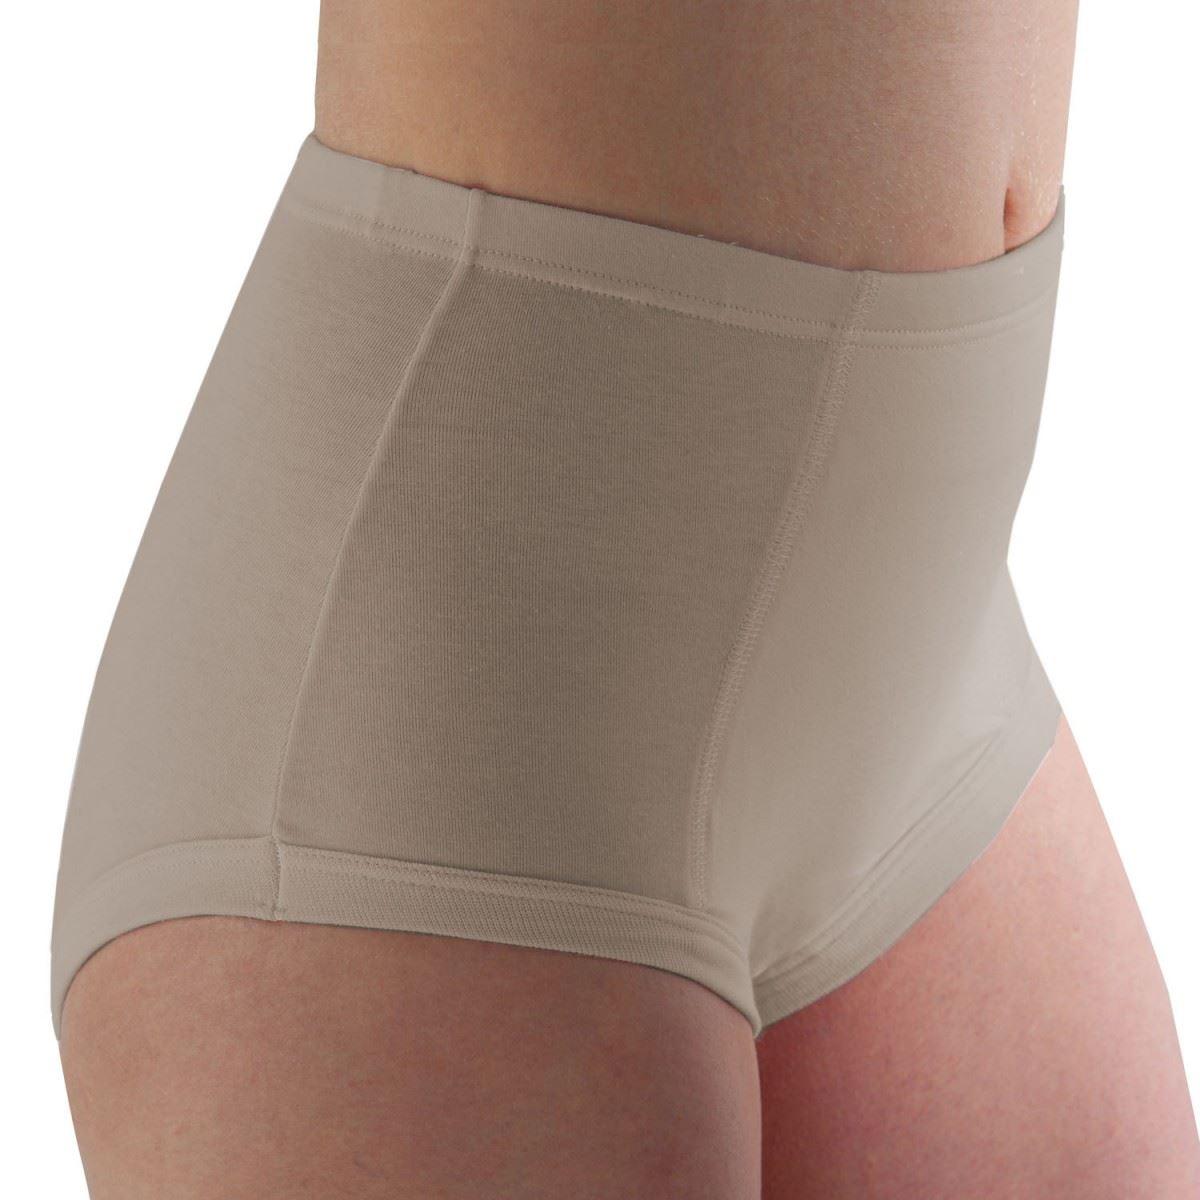 Picture of Conni Women's Classic Reusable Underwear